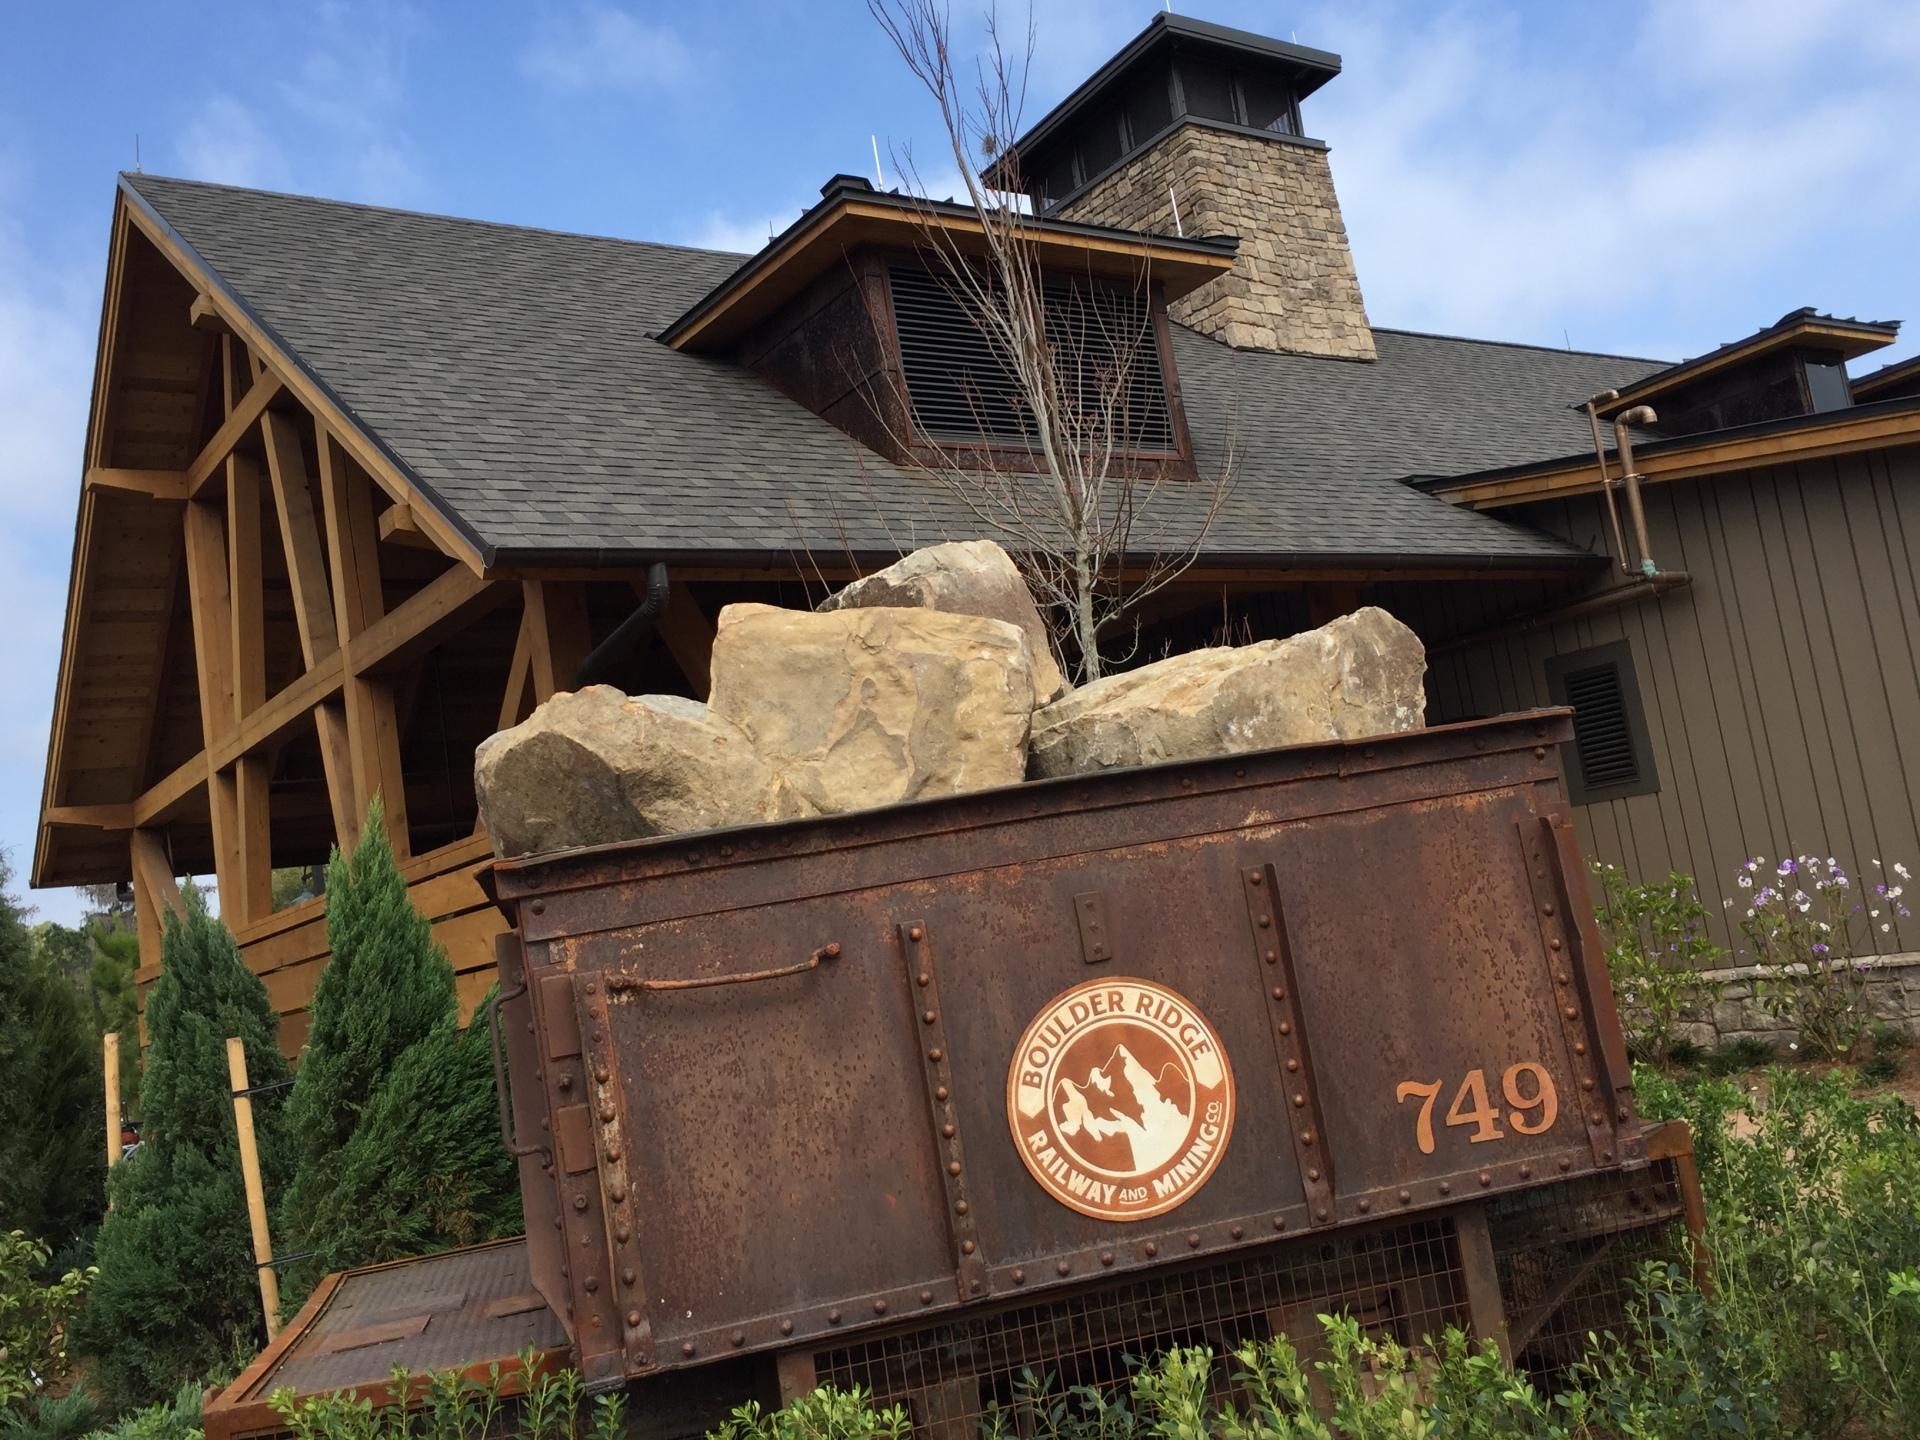 Boulder Ridge Villas at Wilderness Lodge Construction Update